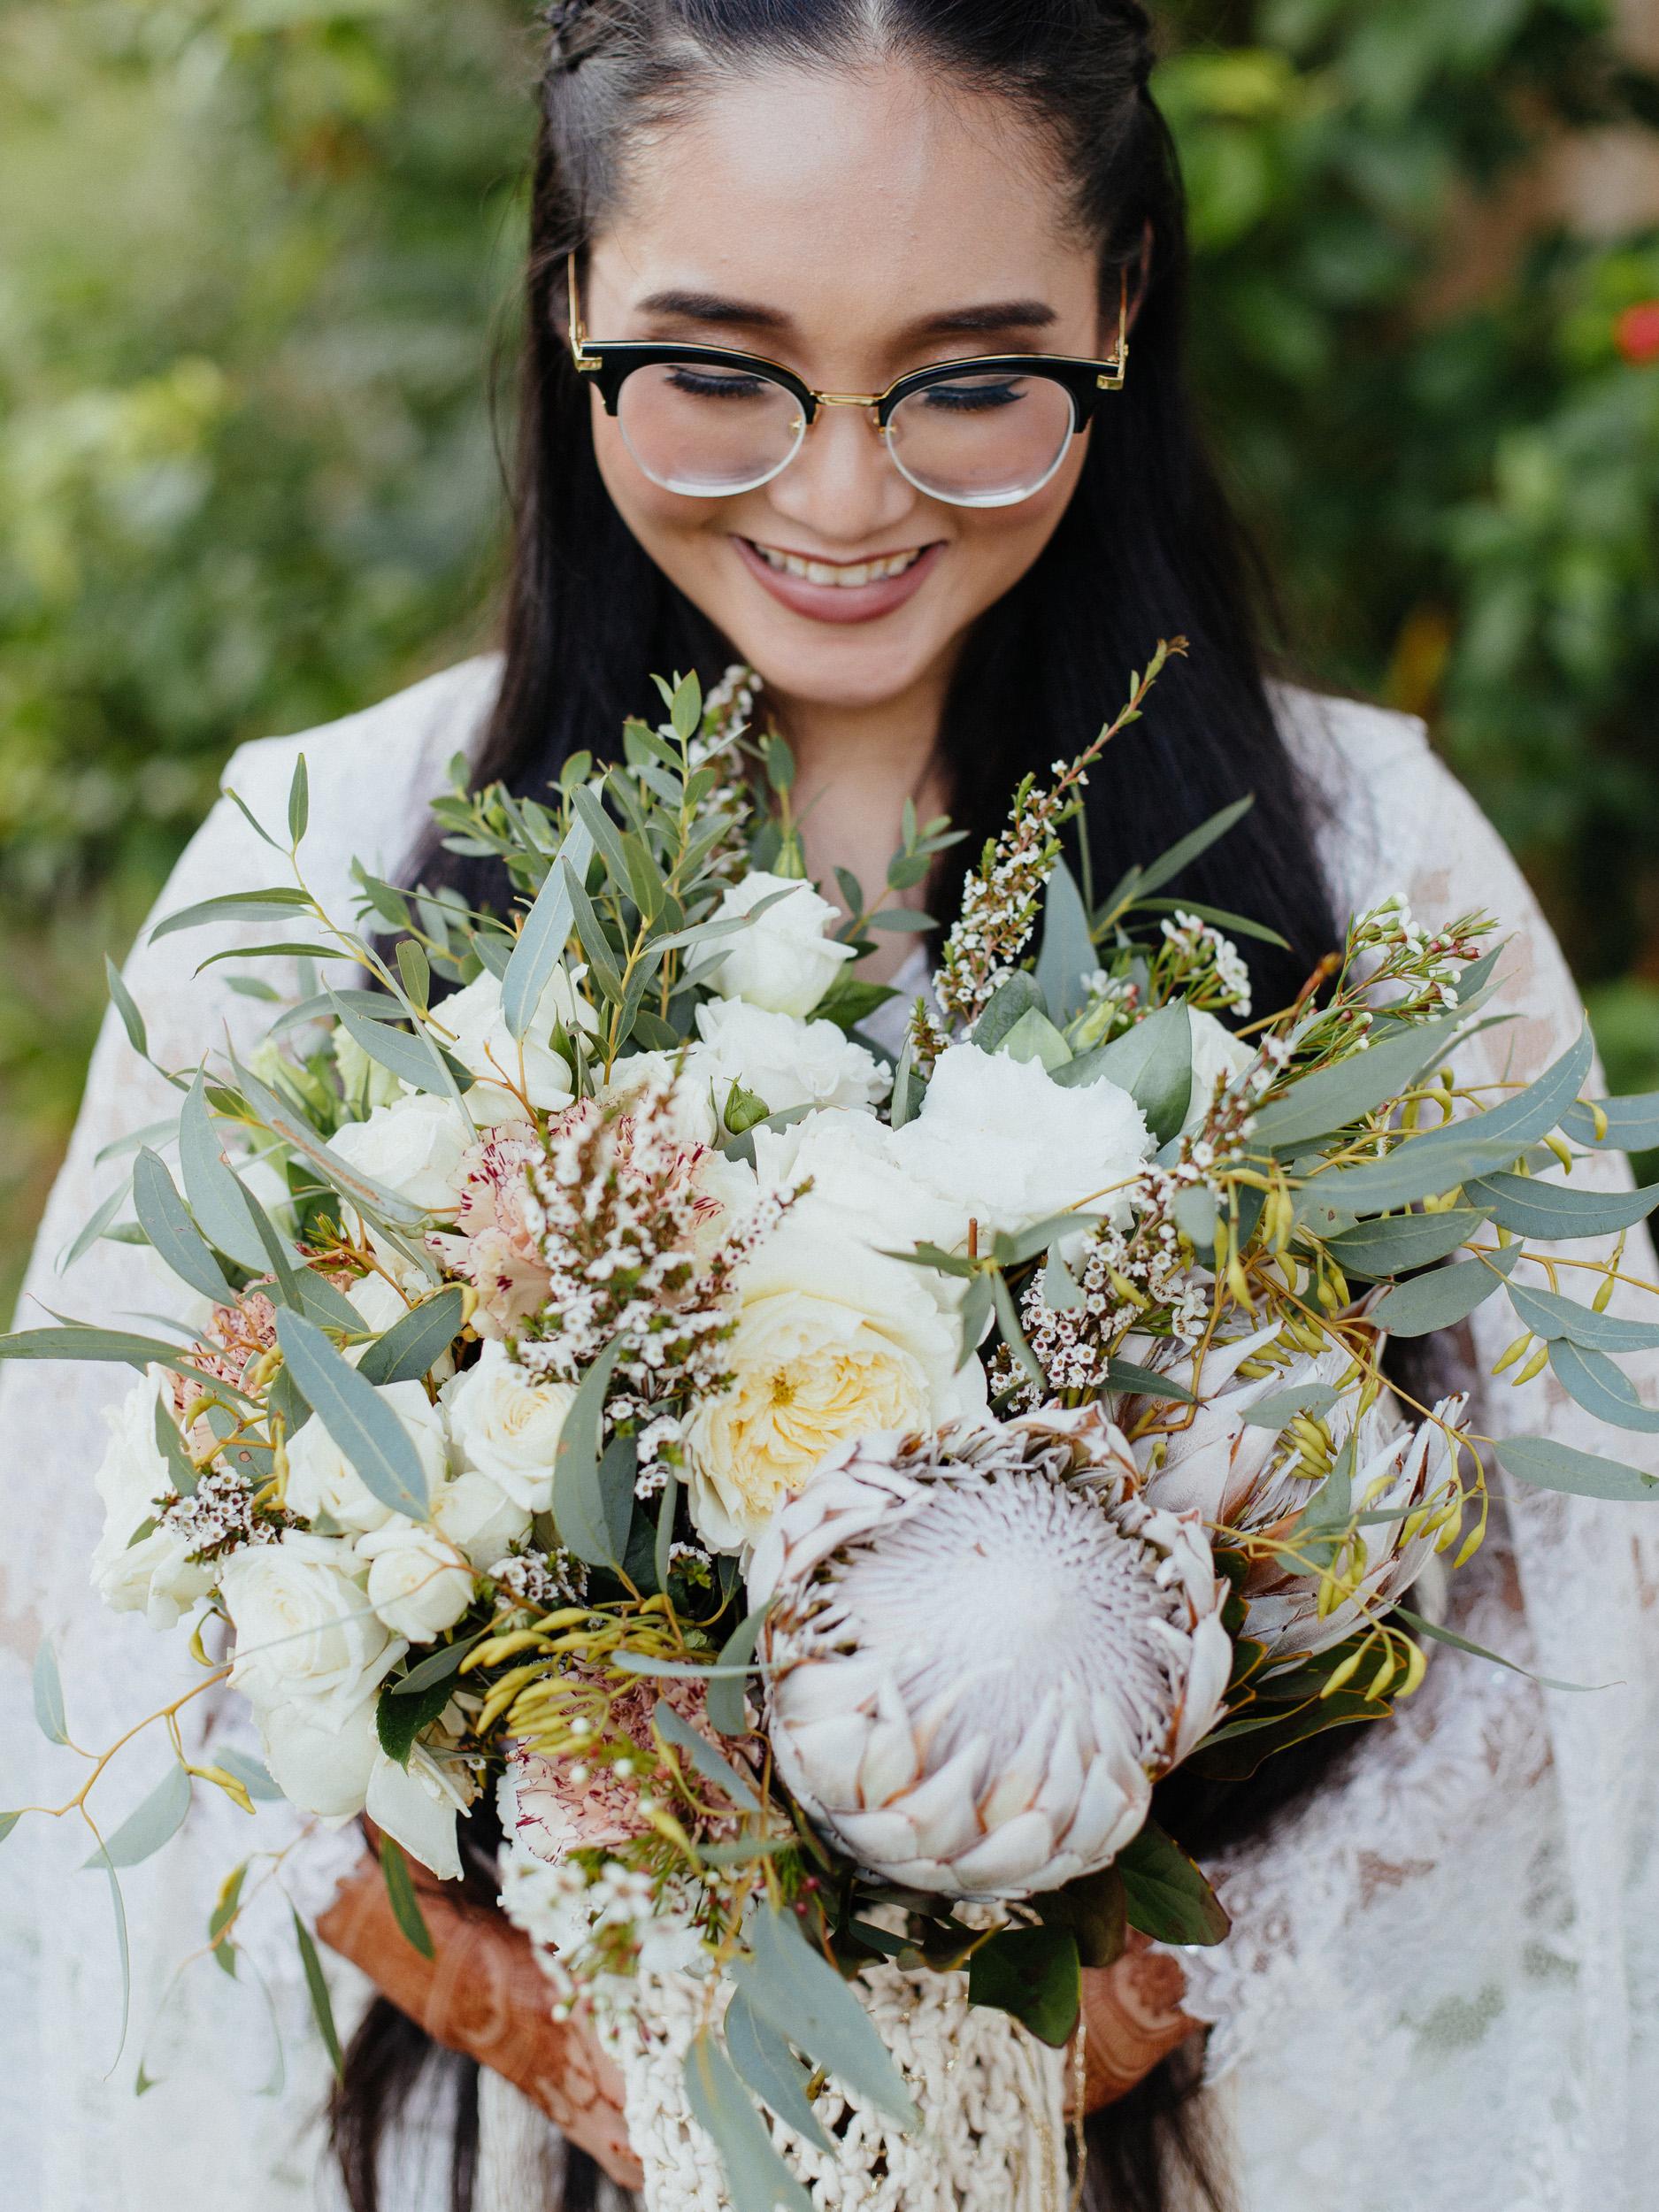 singapore-wedding-photographer-photography-wmt2017-151.jpg